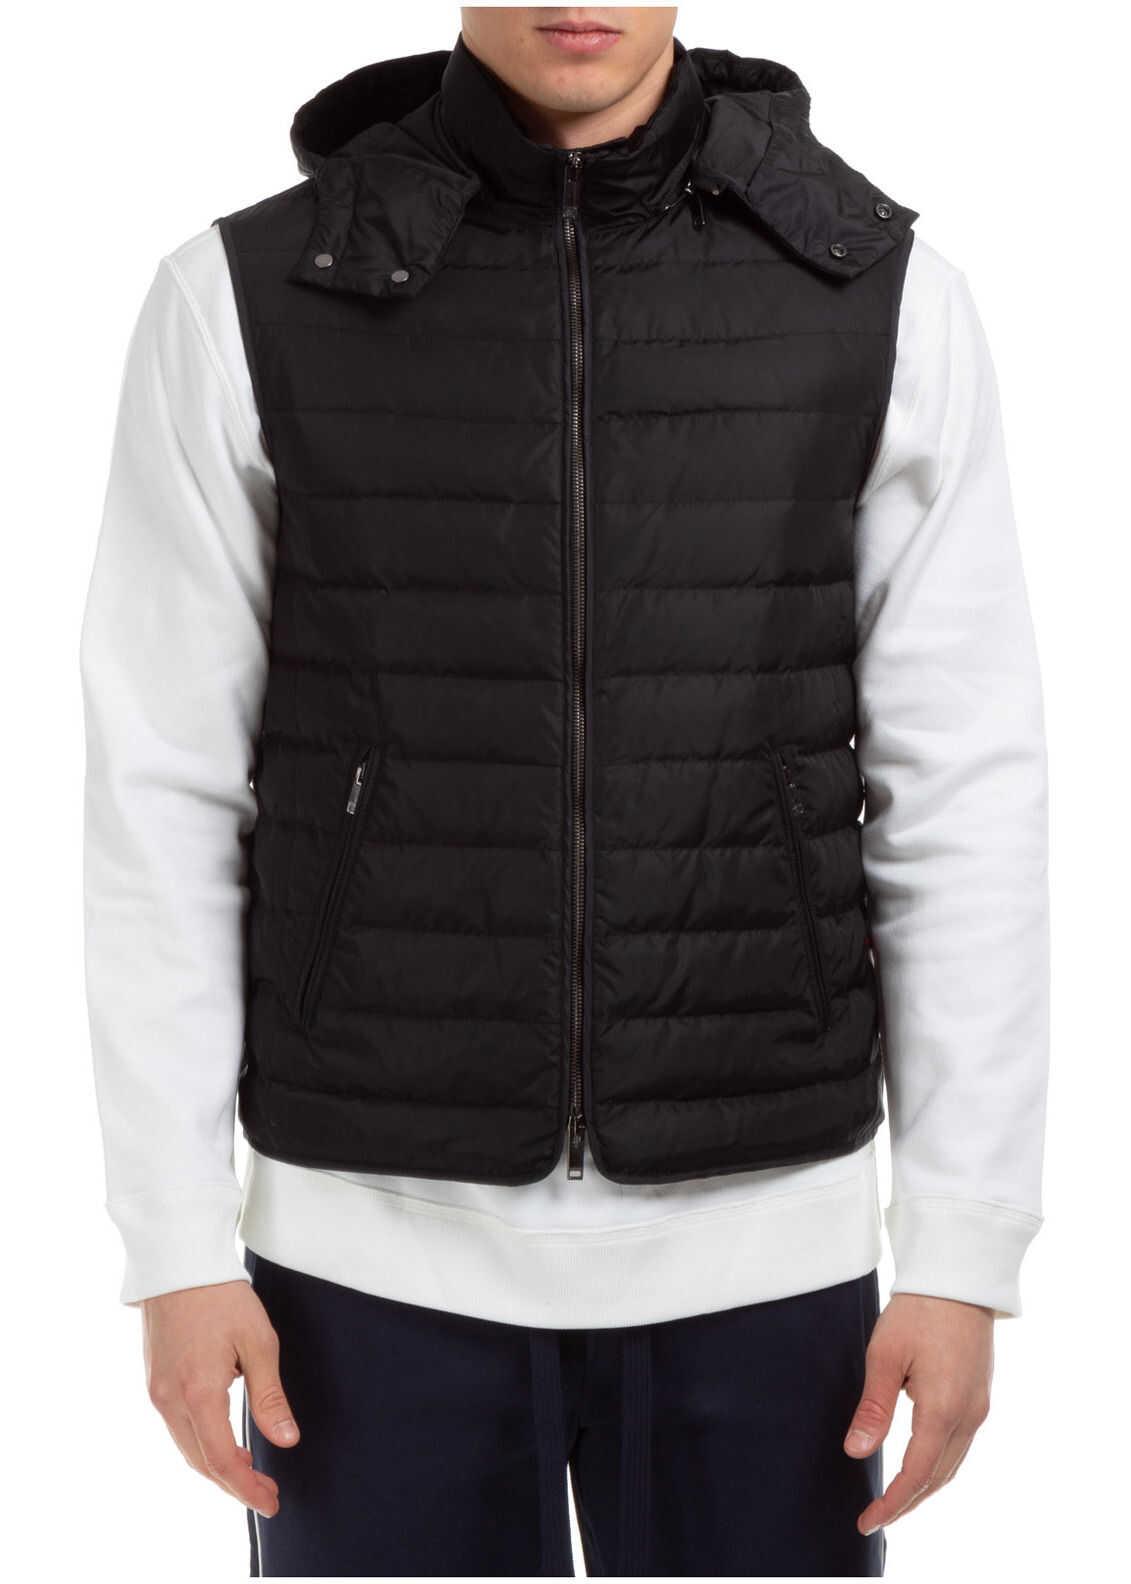 Valentino Garavani Jacket Padded Black